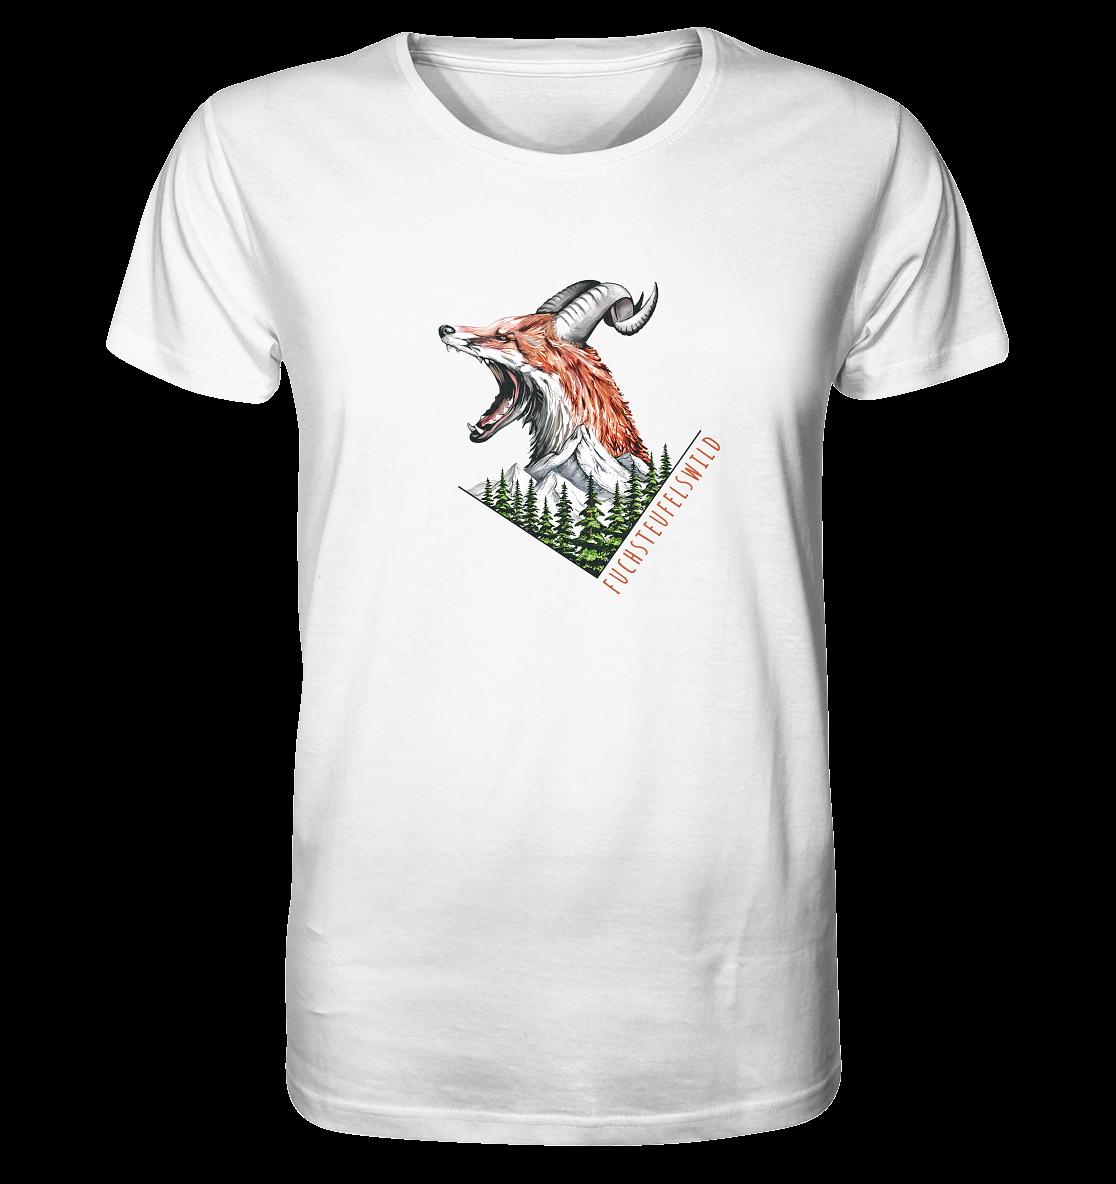 front-organic-shirt-f8f8f8-1116x-1.png